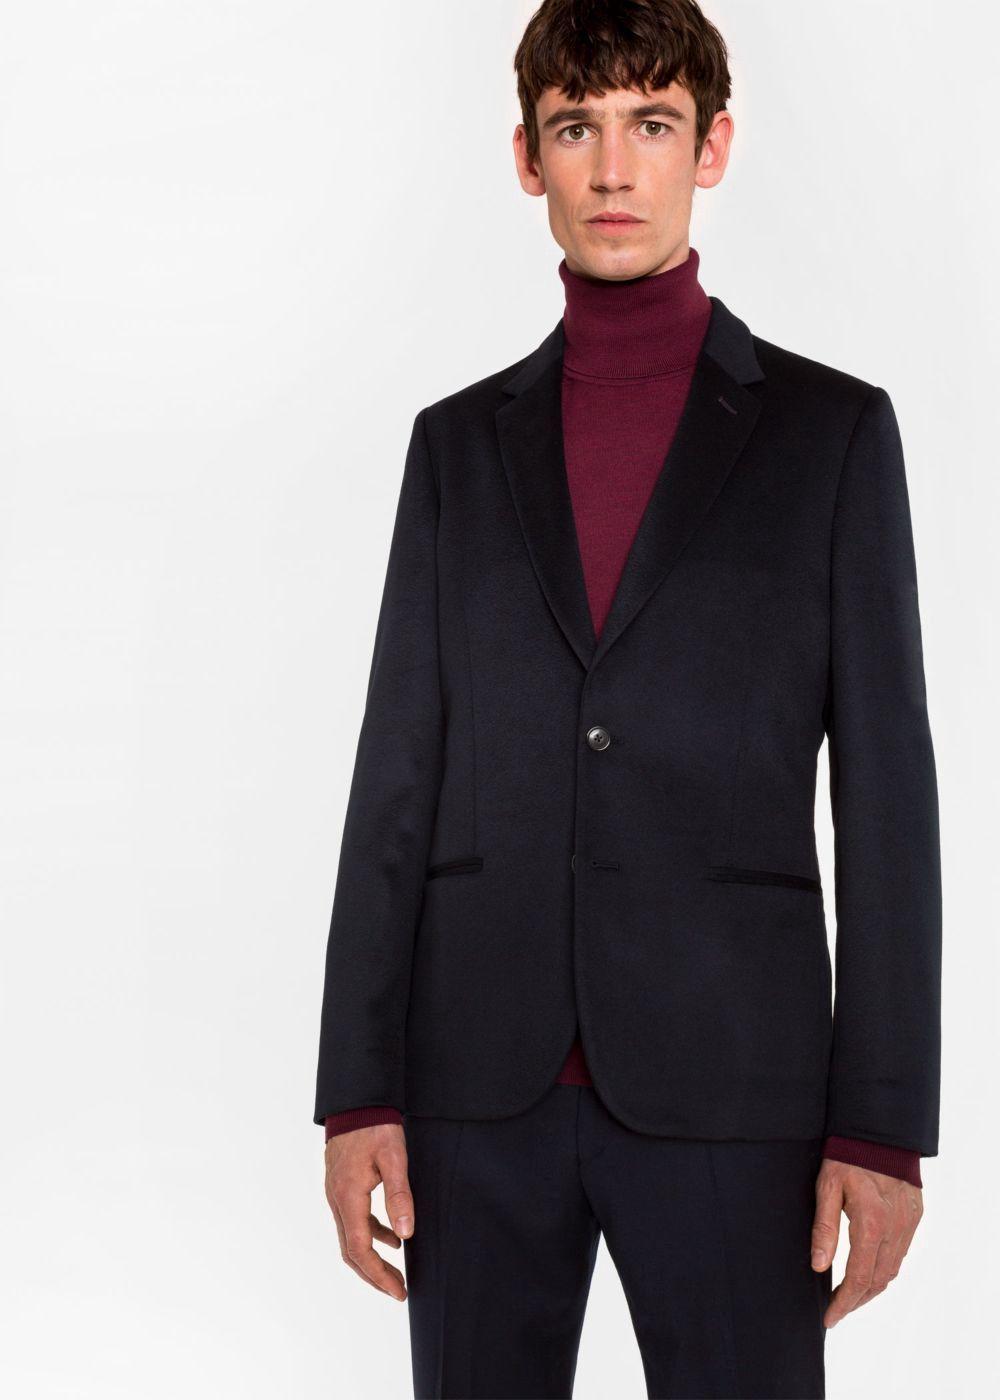 9e1c743795d75 PAUL SMITH Men's Tailored-Fit Dark Navy Unlined Cashmere Blazer. #paulsmith  #cloth #